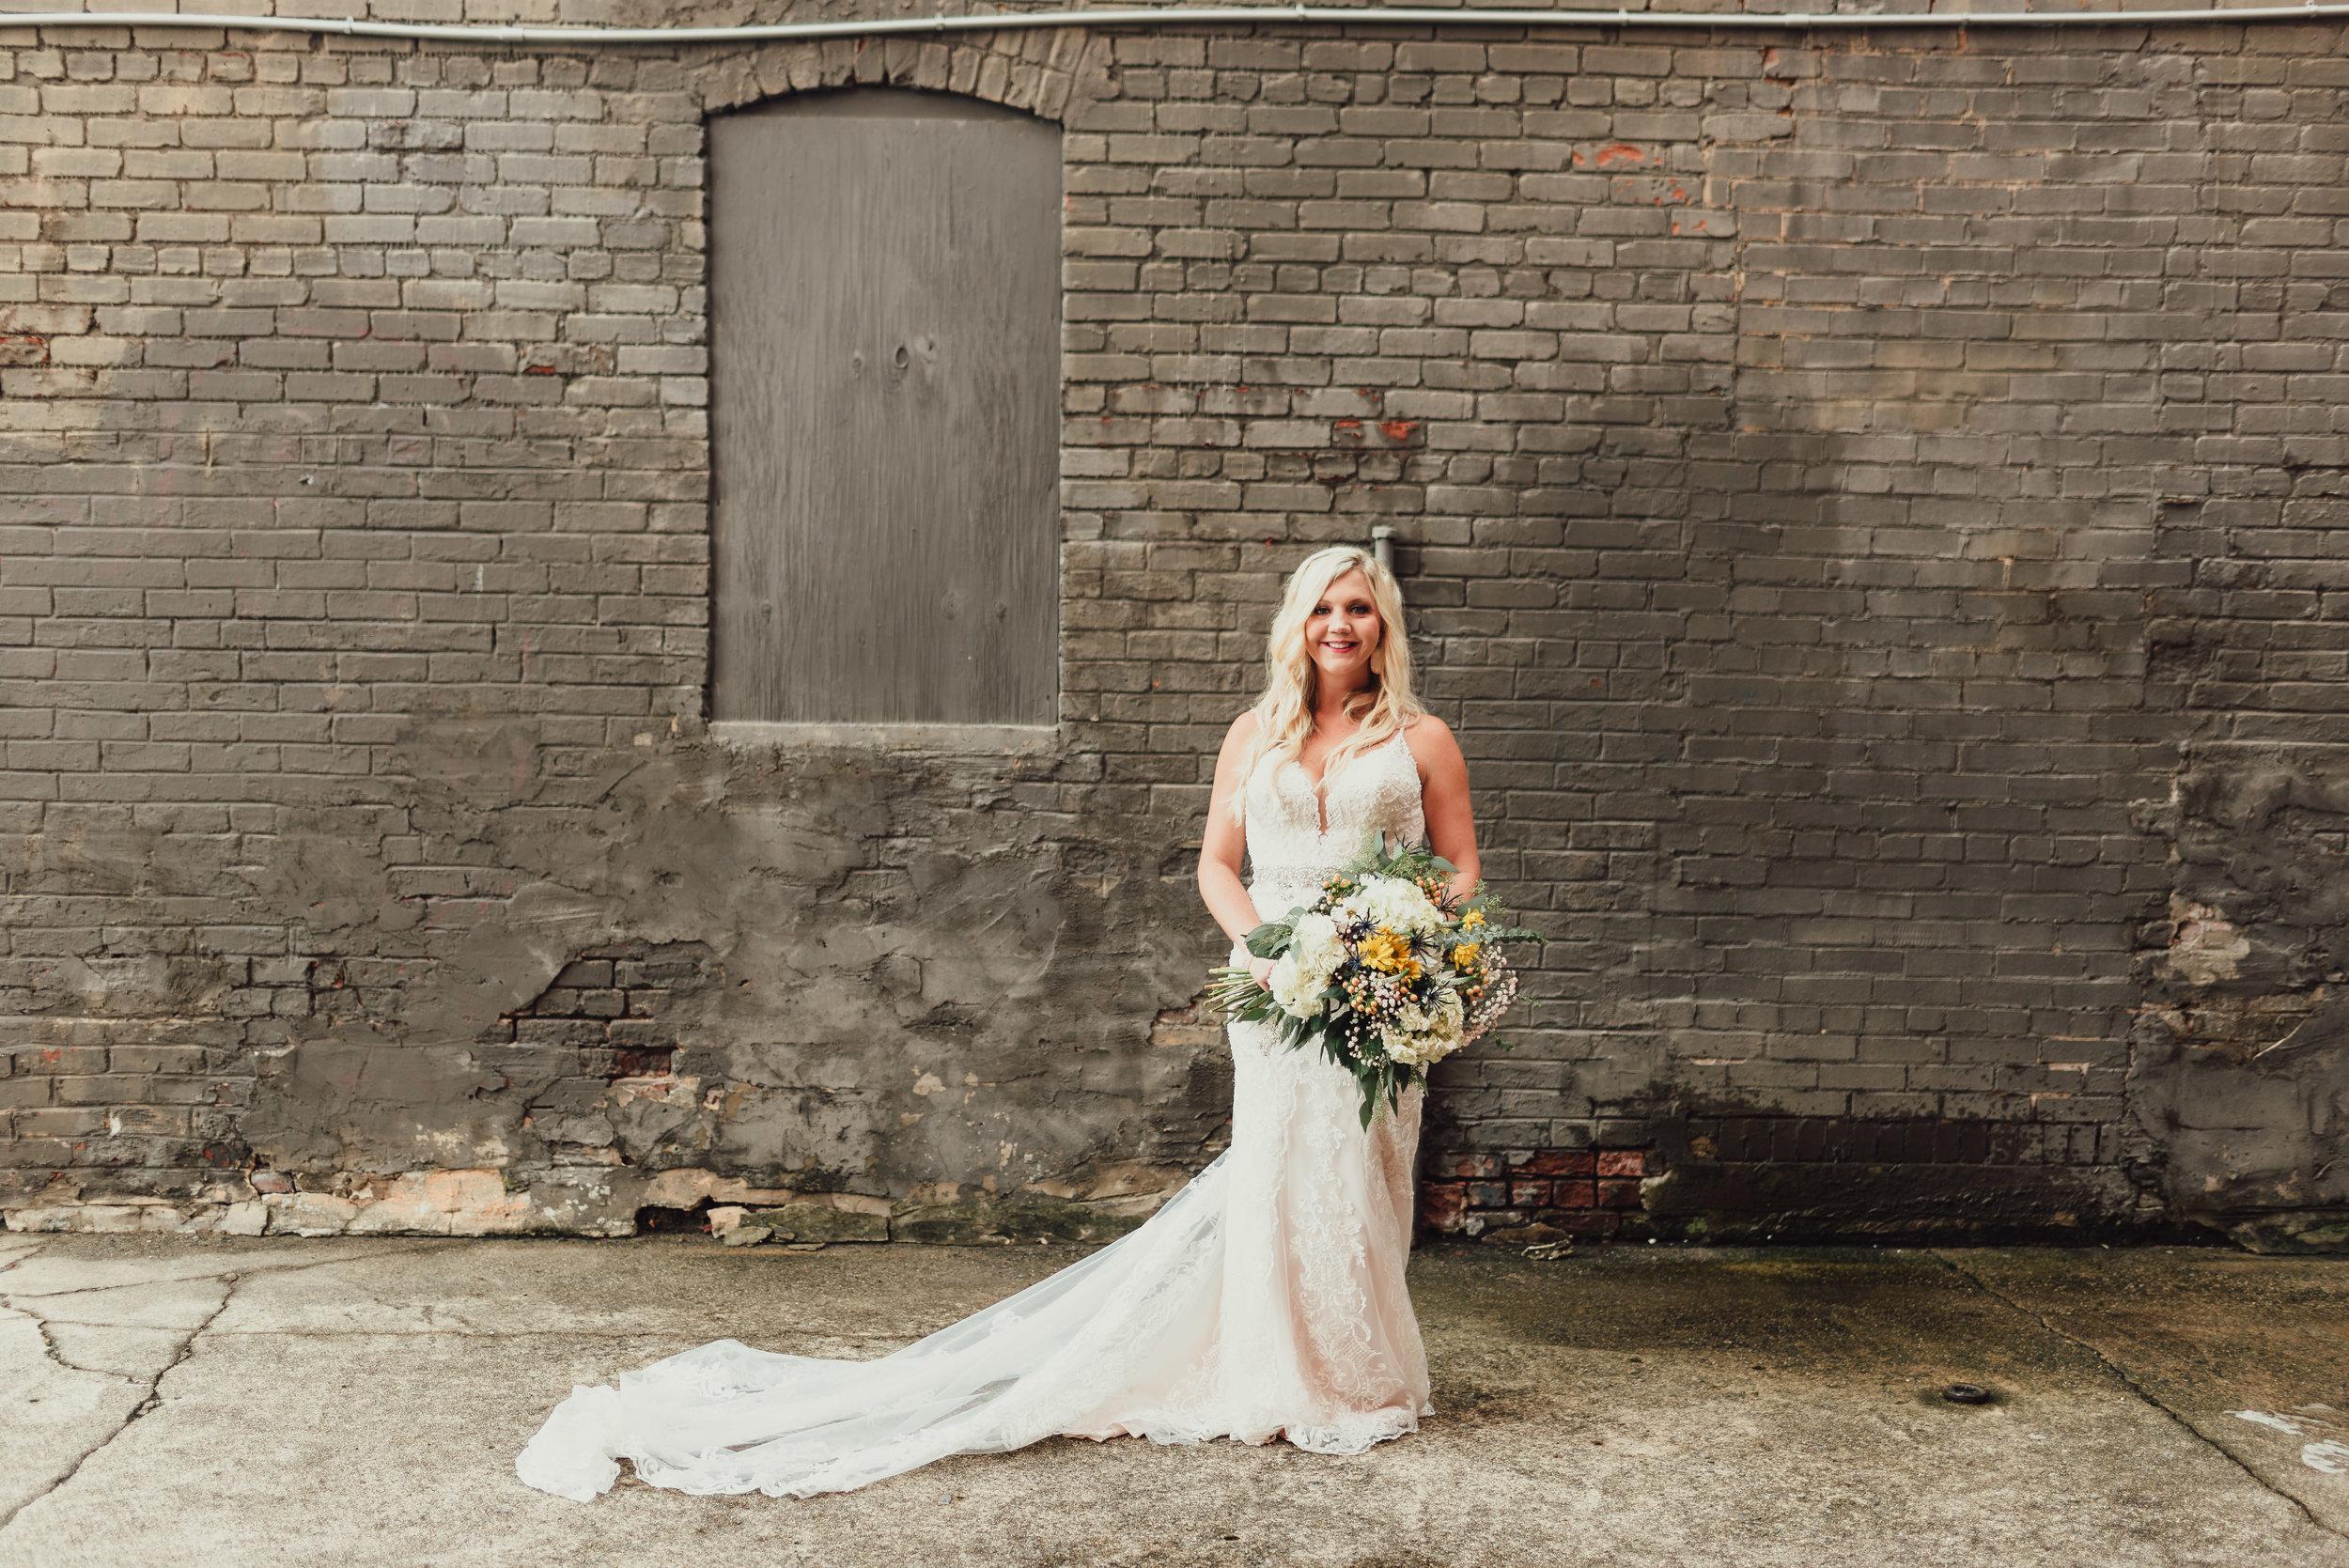 east-tn-wedding-photographer-tennessee-elopement-photographer-kingsport-tn-wedding-photographer (675 of 1001).jpg